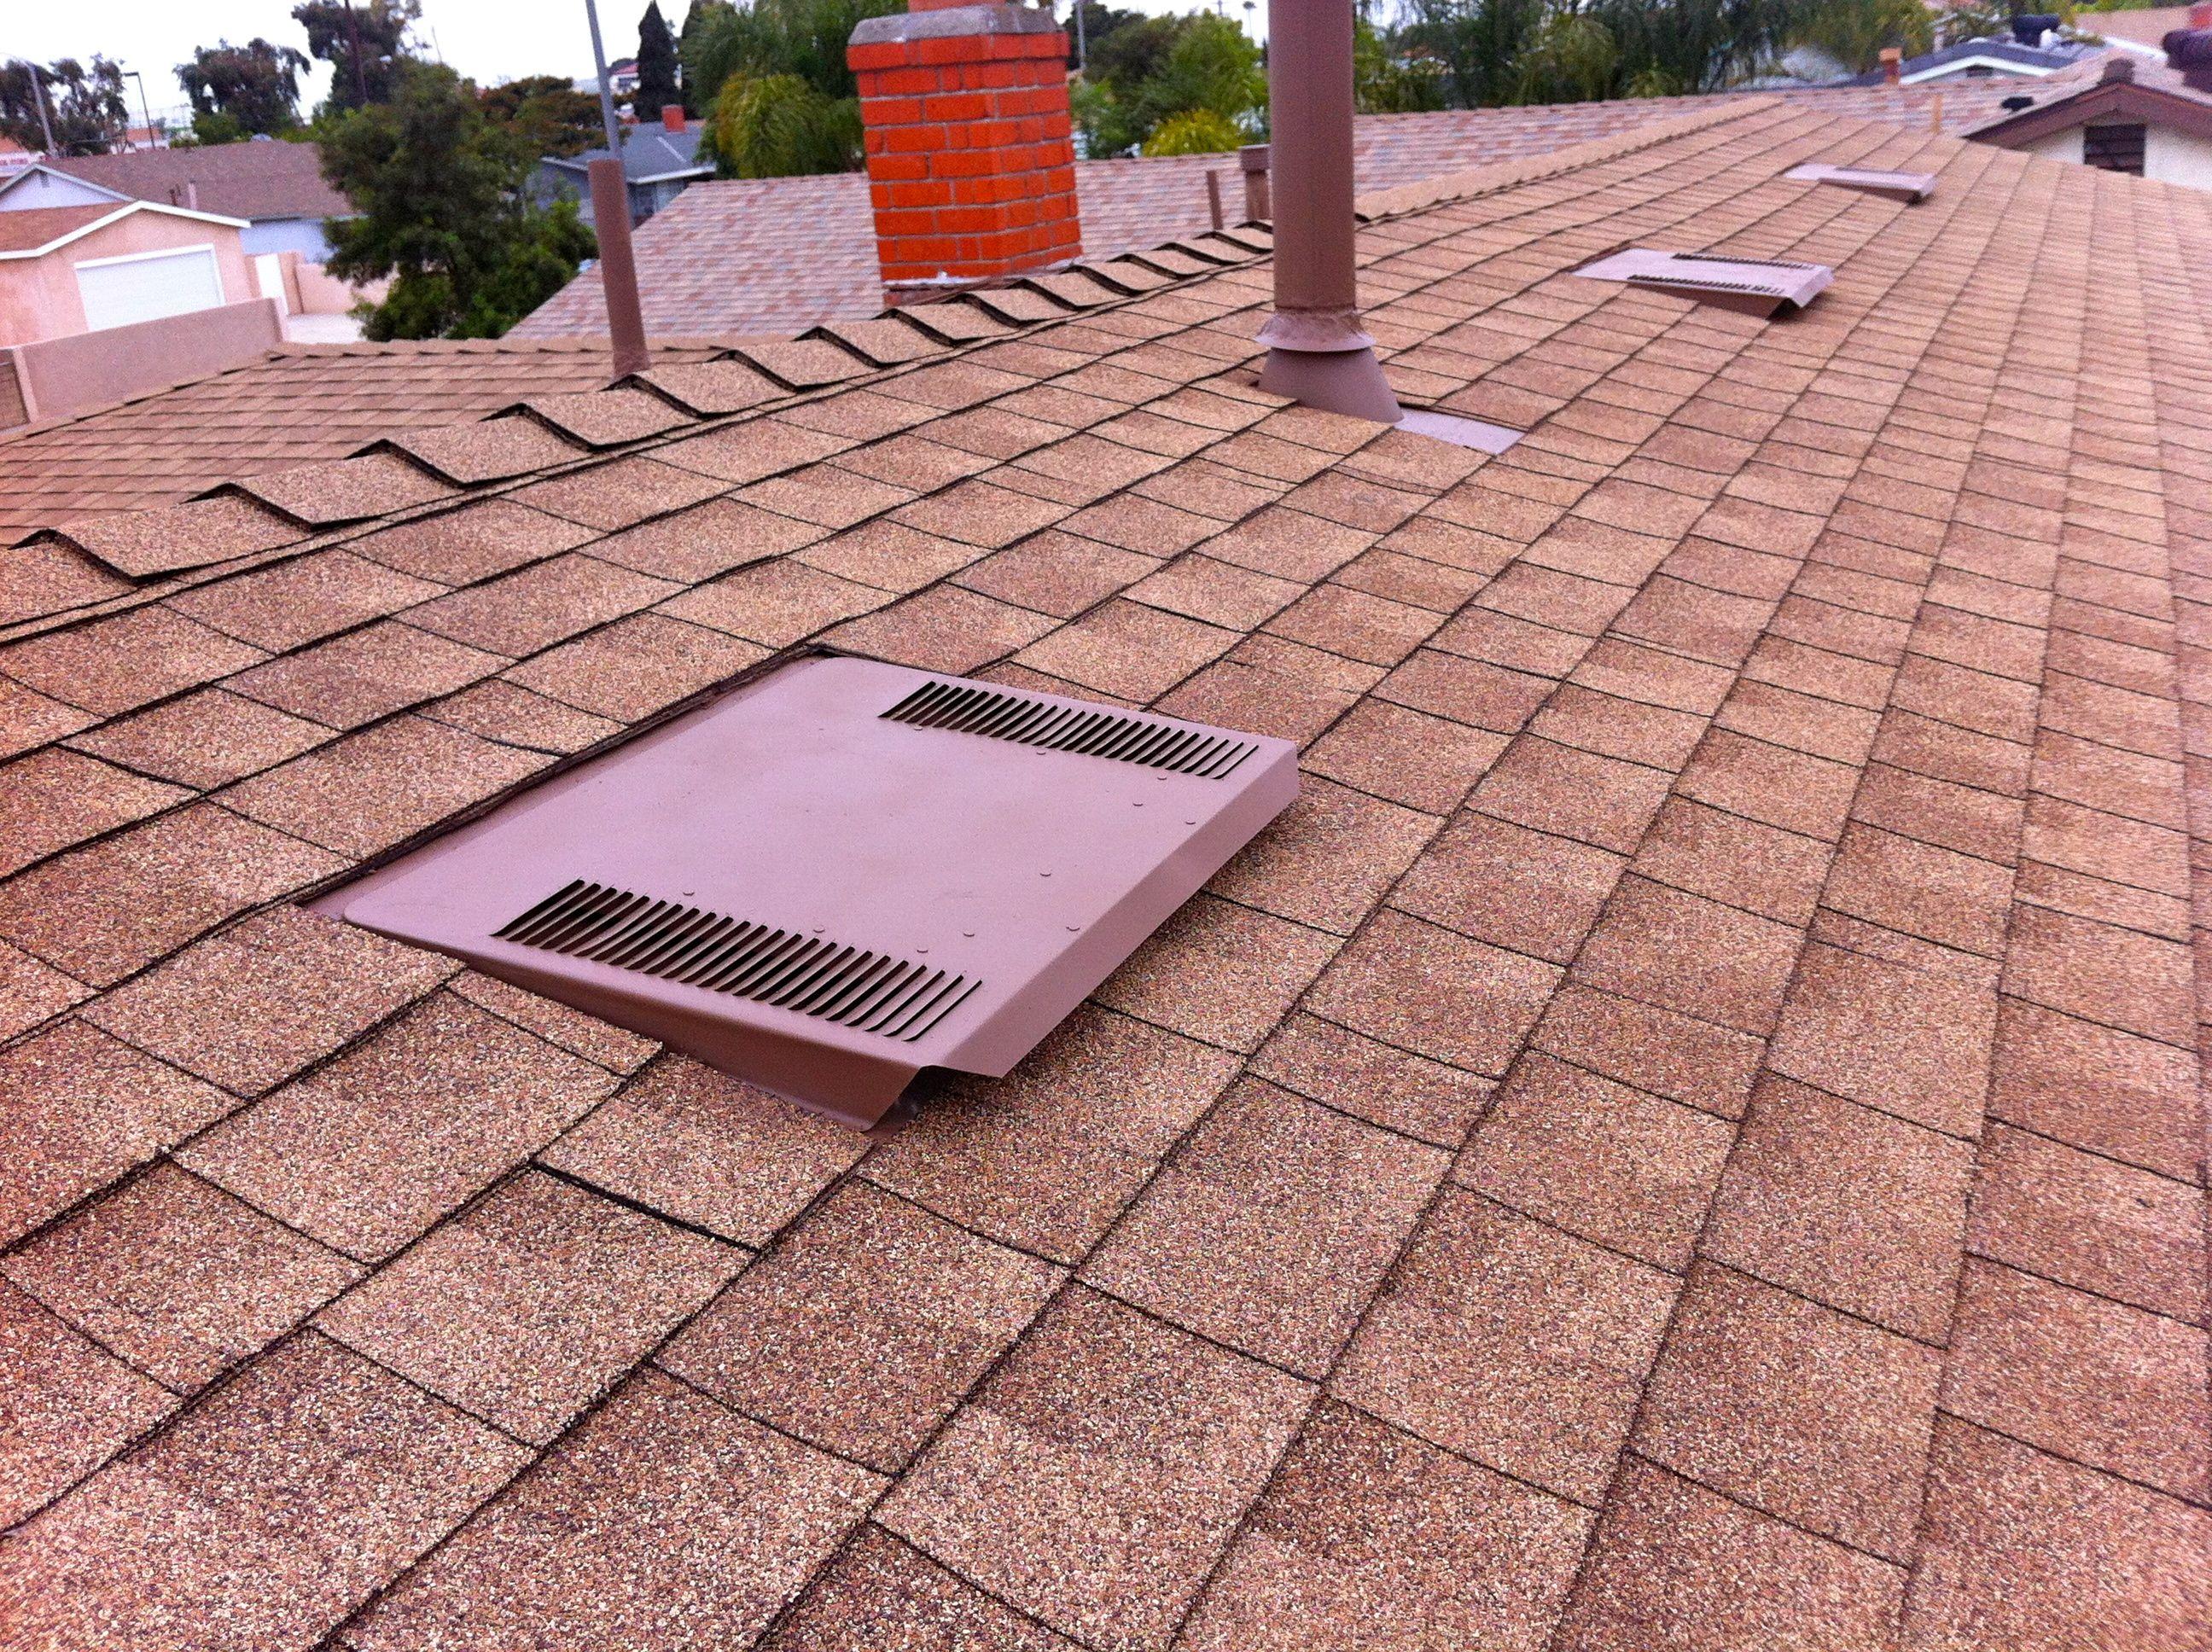 Home Los Angeles Orange County Chandler S Roofing Solar Best Solar Panels Solar Panels Solar Heating